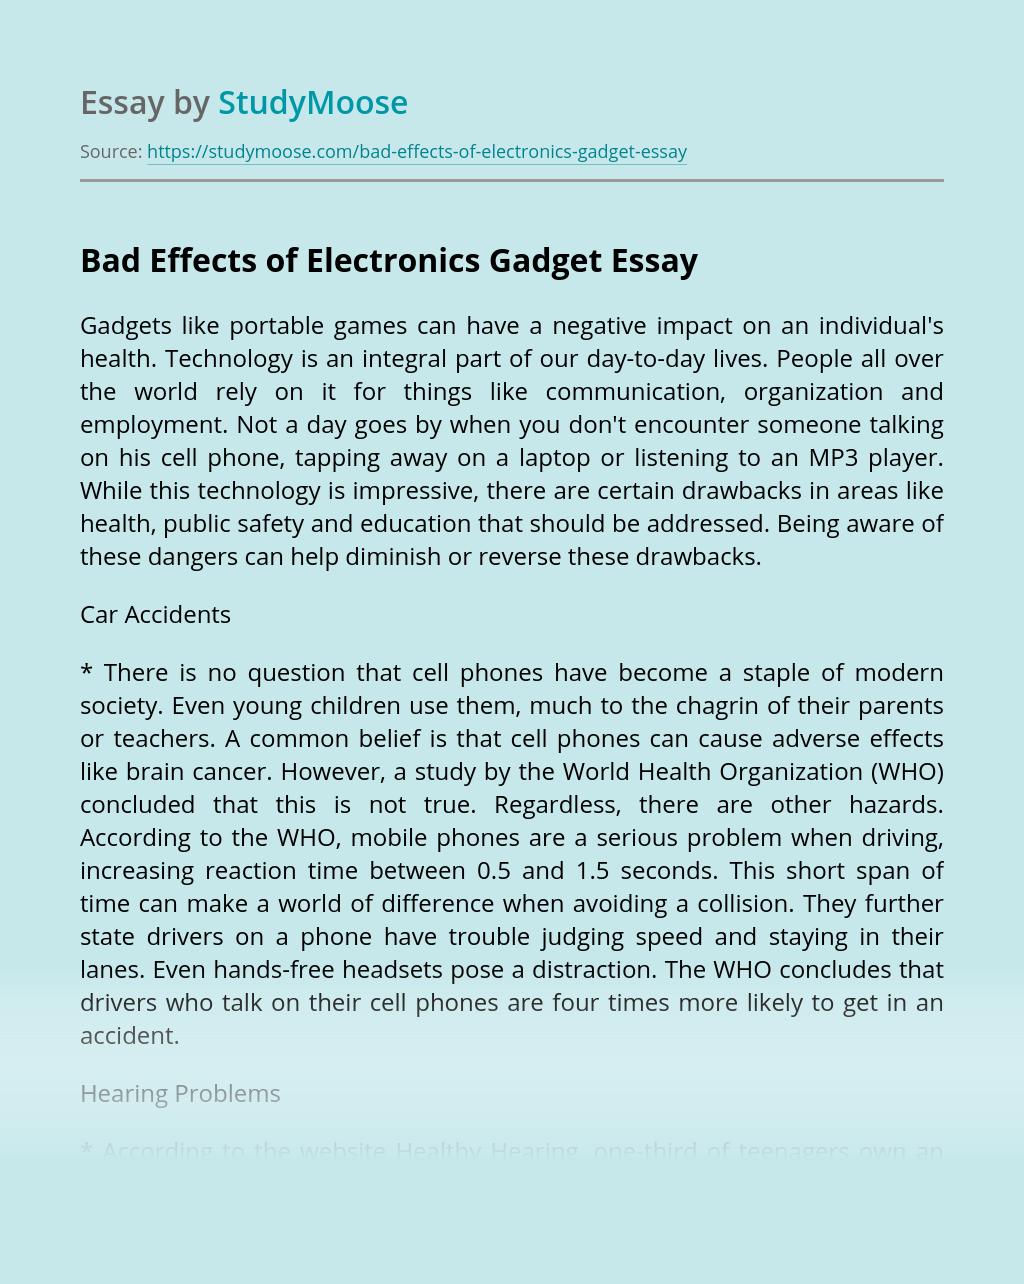 Bad Effects of Electronics Gadget